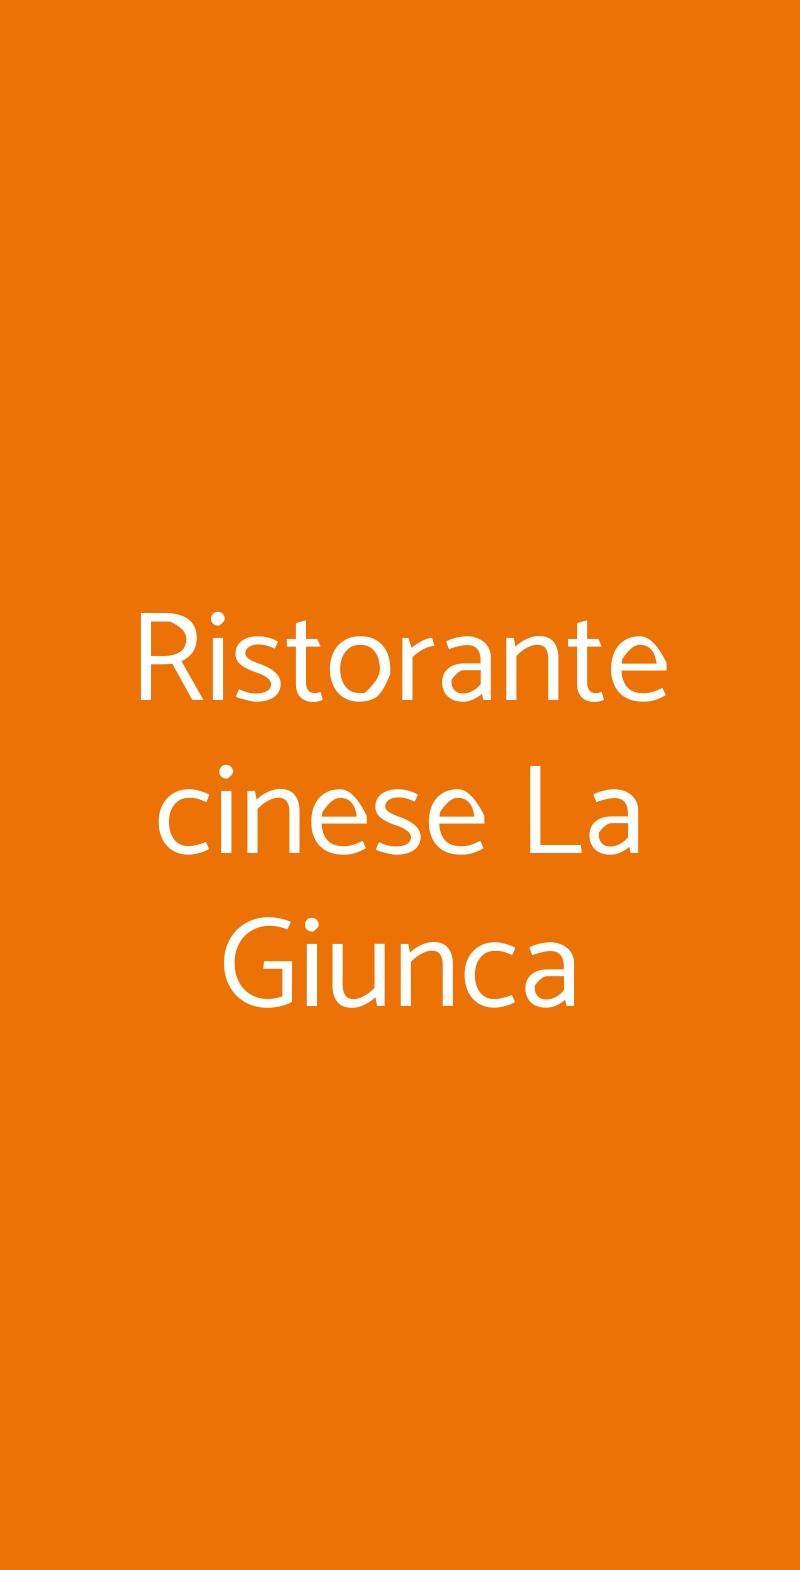 Ristorante cinese La Giunca Torino menù 1 pagina